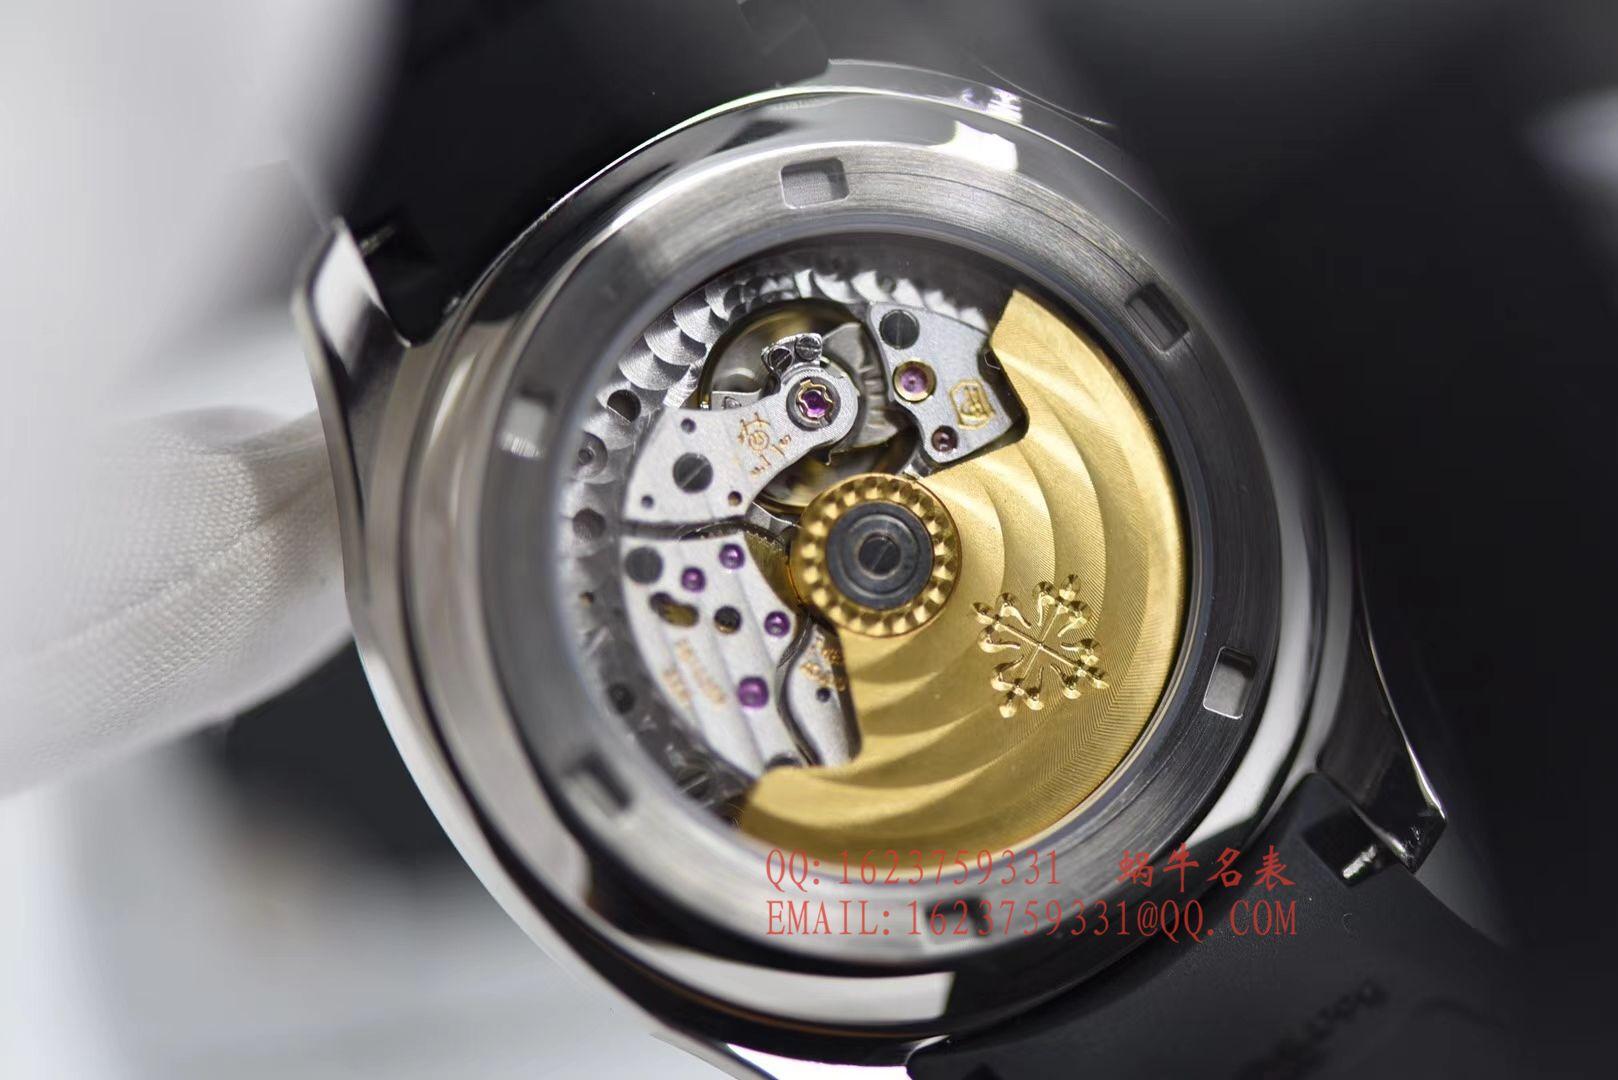 【BP1:1超A高仿手表】百达翡丽AQUANAUT系列5167A-001腕表《百达翡丽手雷》 / BD160